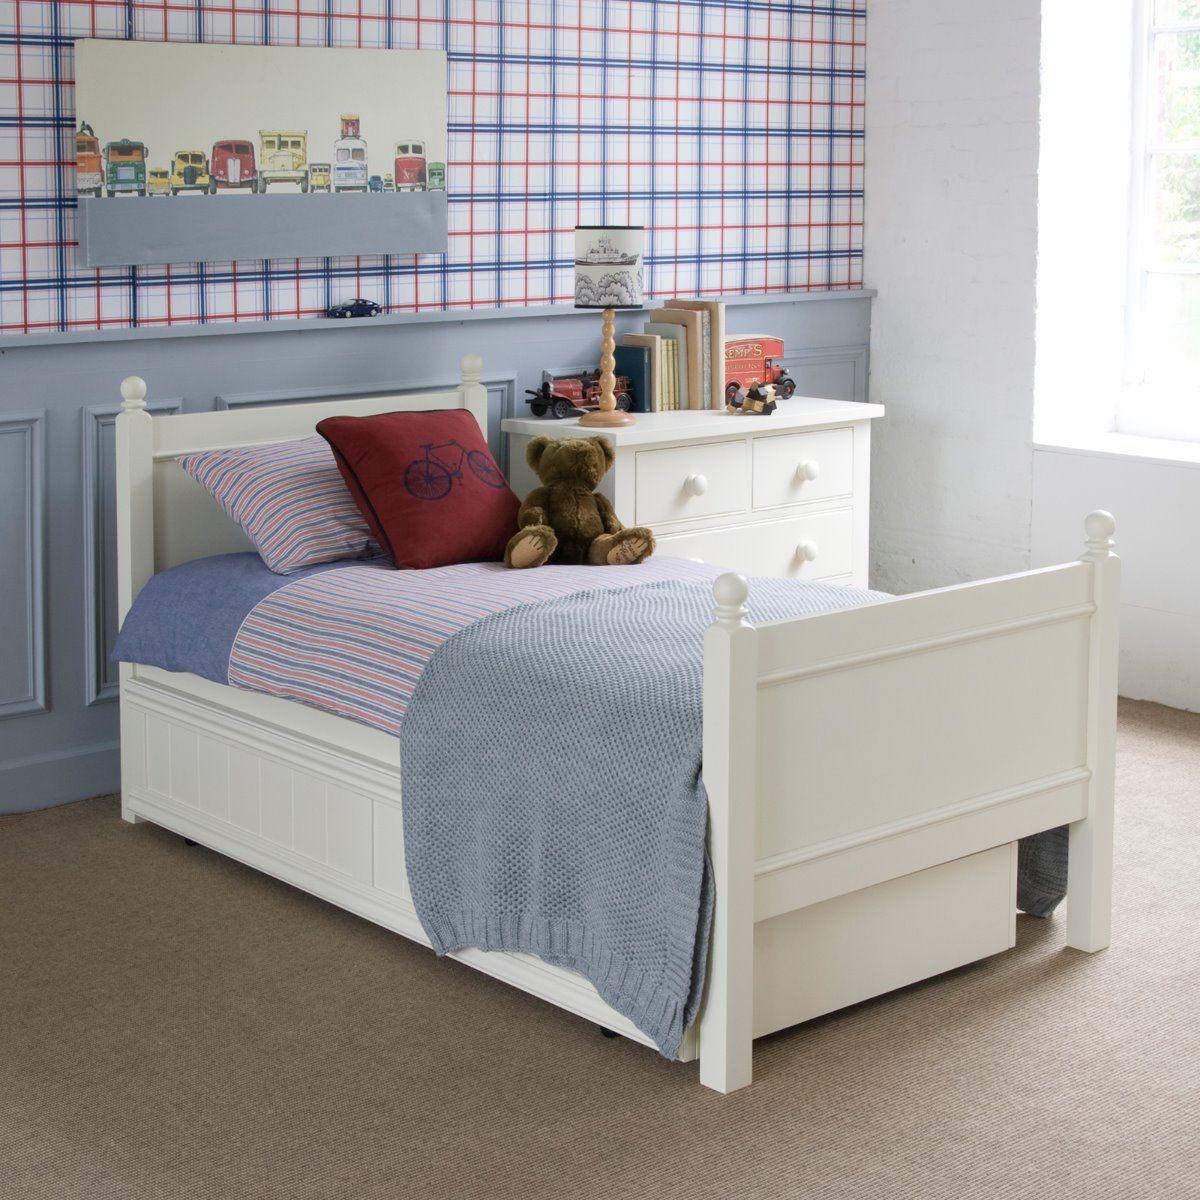 Fargo Single Bed - Ivory White by Little Folks